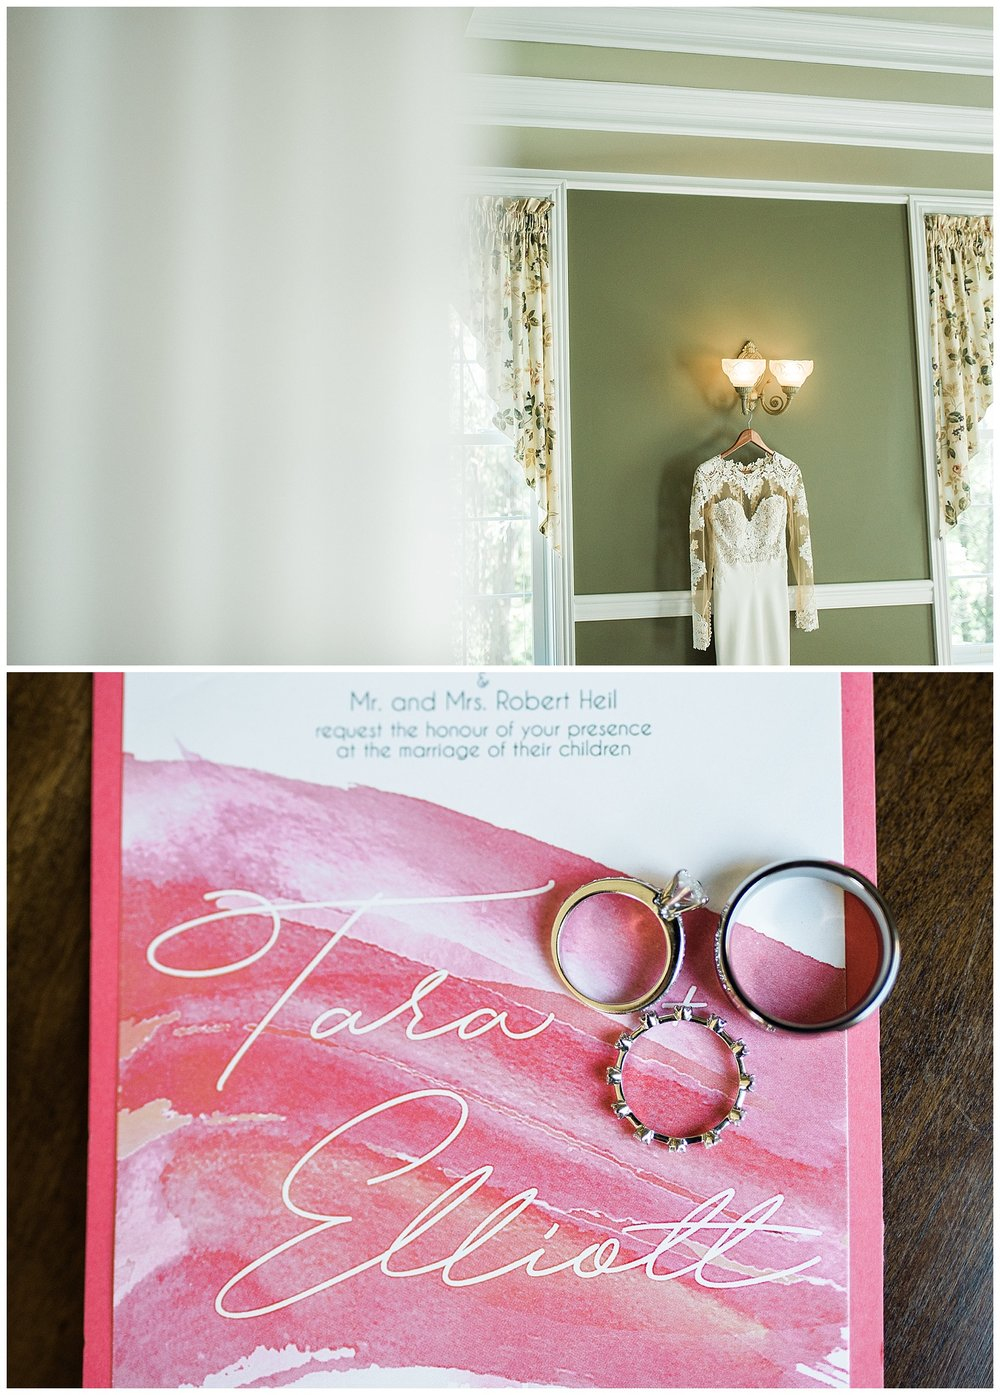 everleigh-photography-cincinnati-wedding-photographer-best-moments-of-2016-cincinnati-wedding-cincinnati-weddings-14